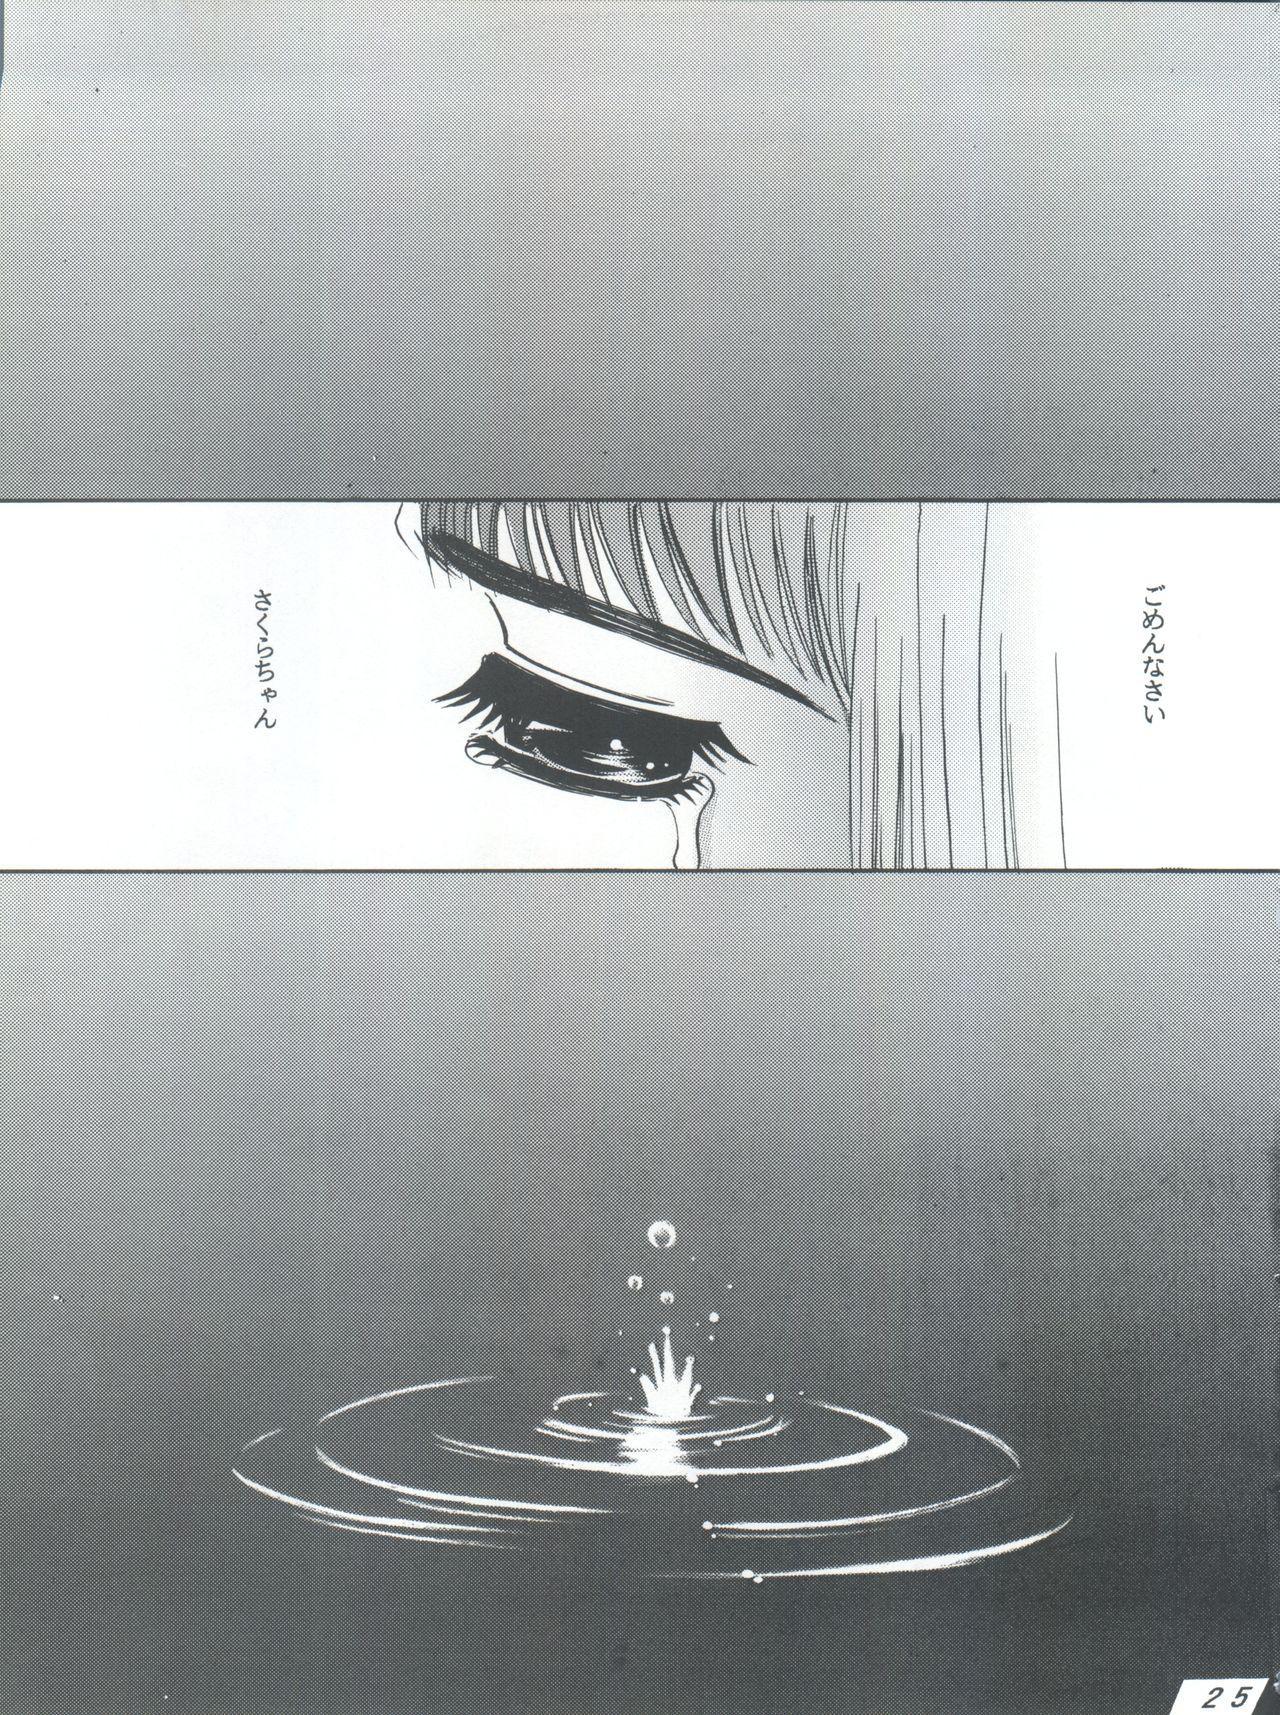 Card Captor Sakura Act 3 Green Version 24